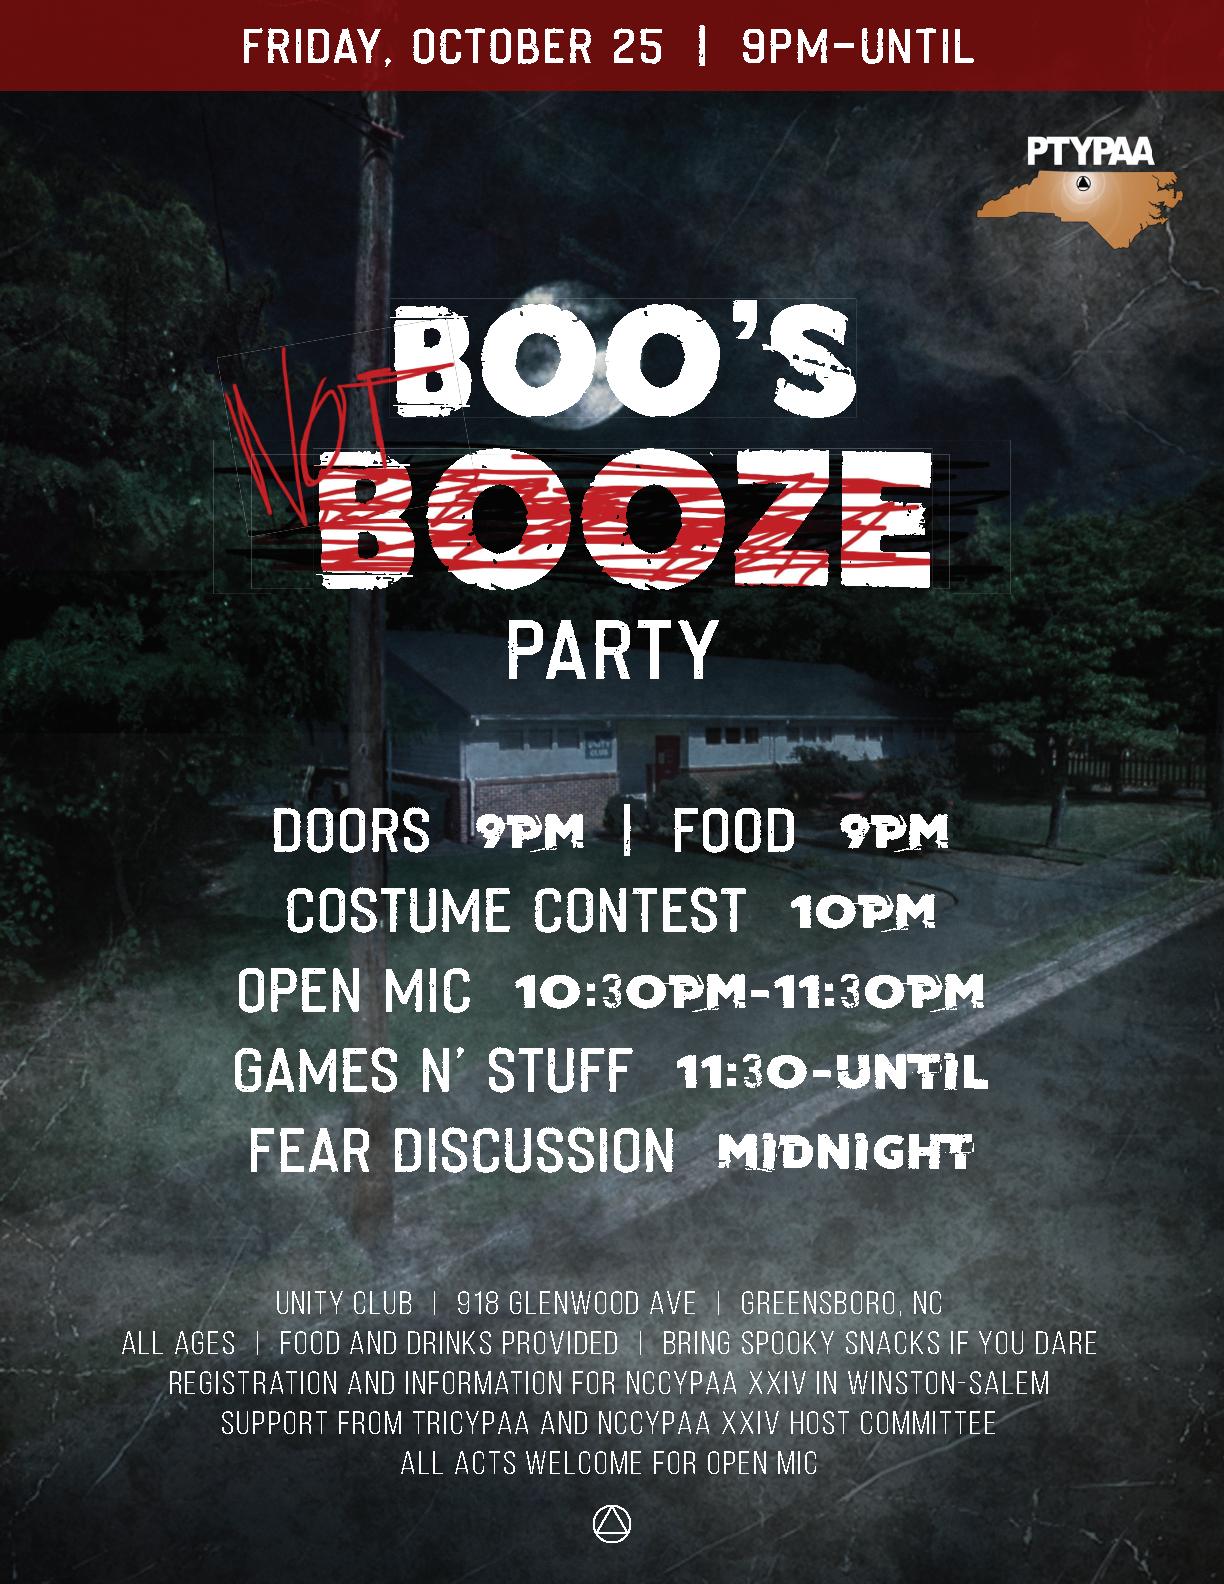 Boos not Booze - PTYPAA Halloween Party @ Unity Club